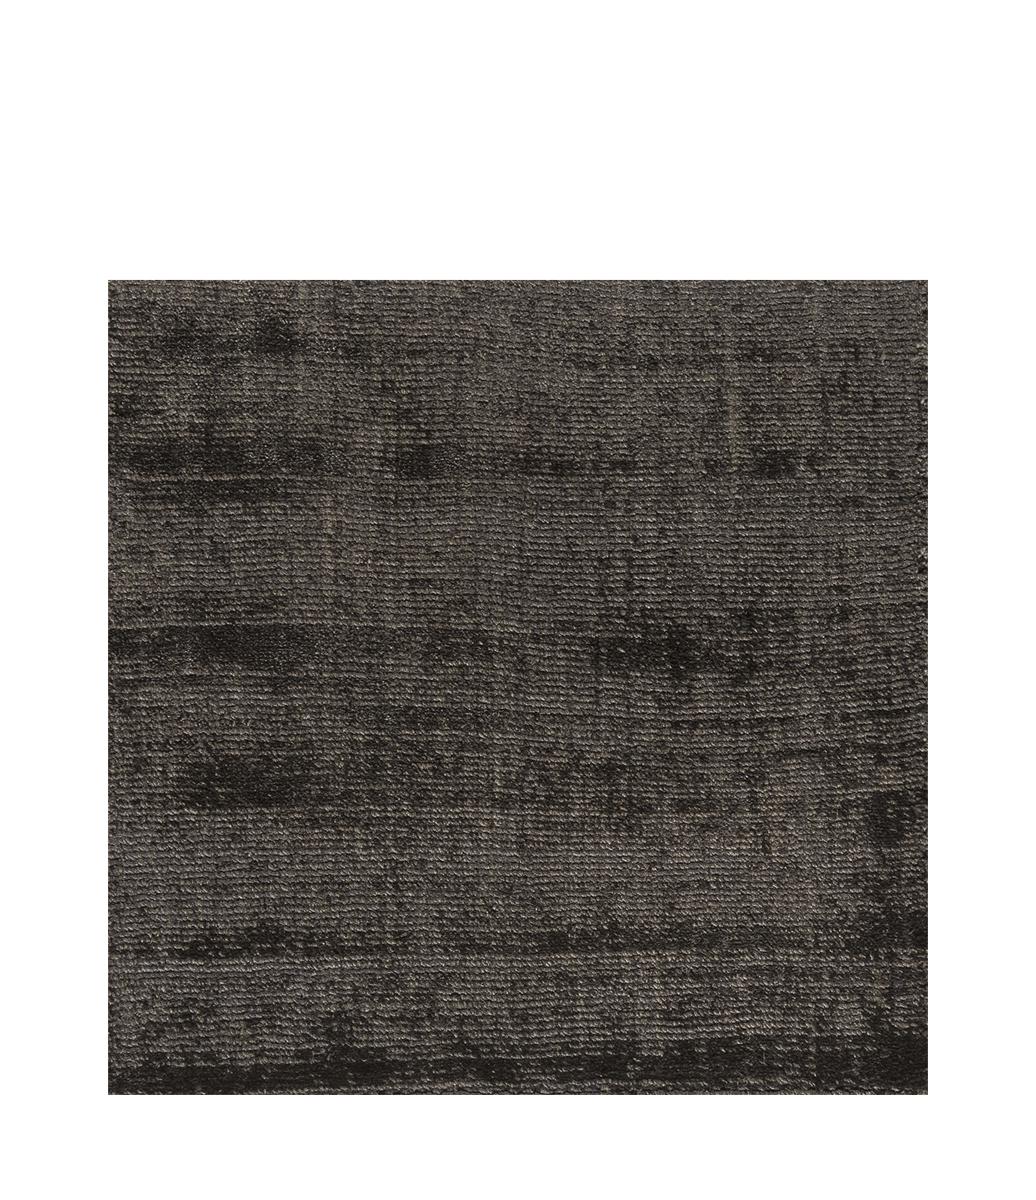 SHADOW Carpet 200x300